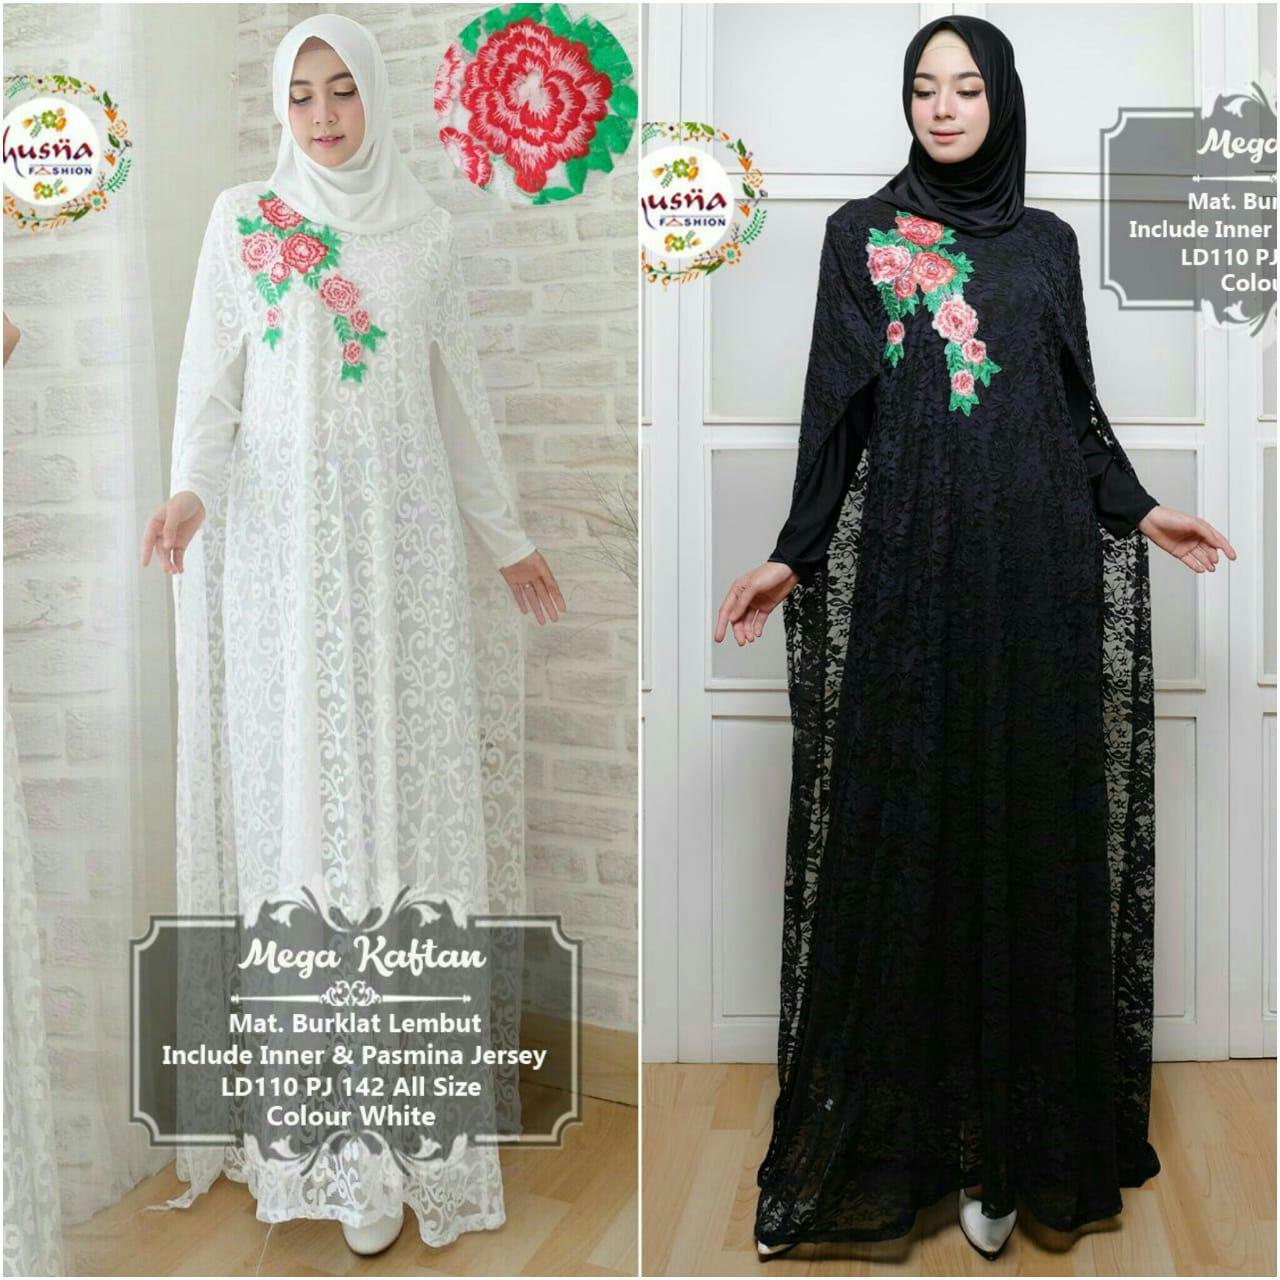 Review Dress Muslimah Gaul Mega Kaftan Model Baju Pesta Batik